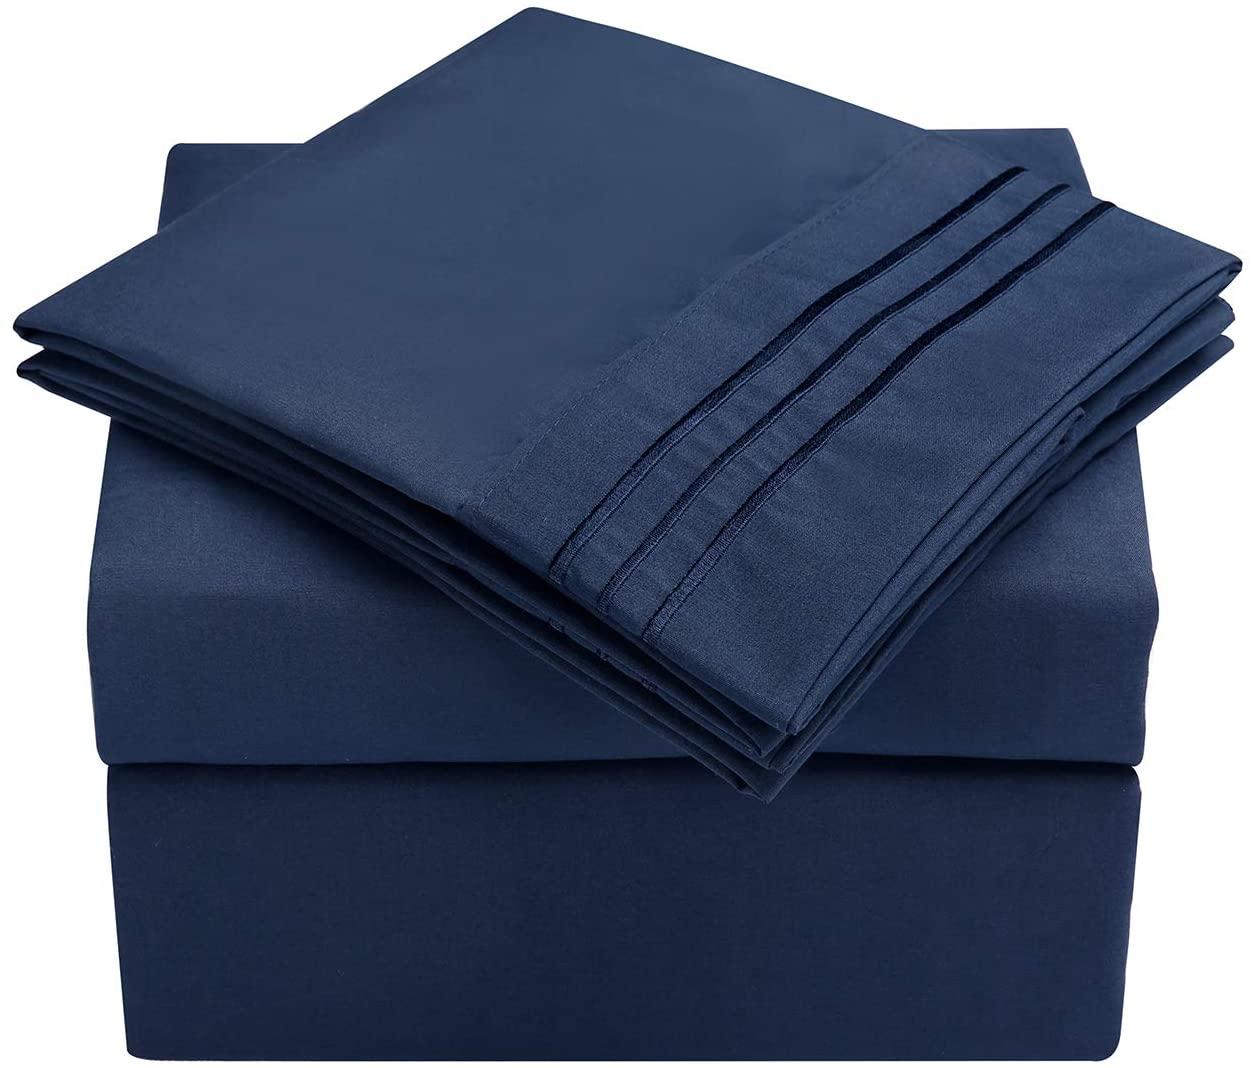 HooSeen 4-Pieces Bed Sheets Set 1800 Series Microfiber-Wrinkle & Fade Resistant, Deep Pocket, Hypoallergenic Bedding Set, Pillow Case (Navy, King)